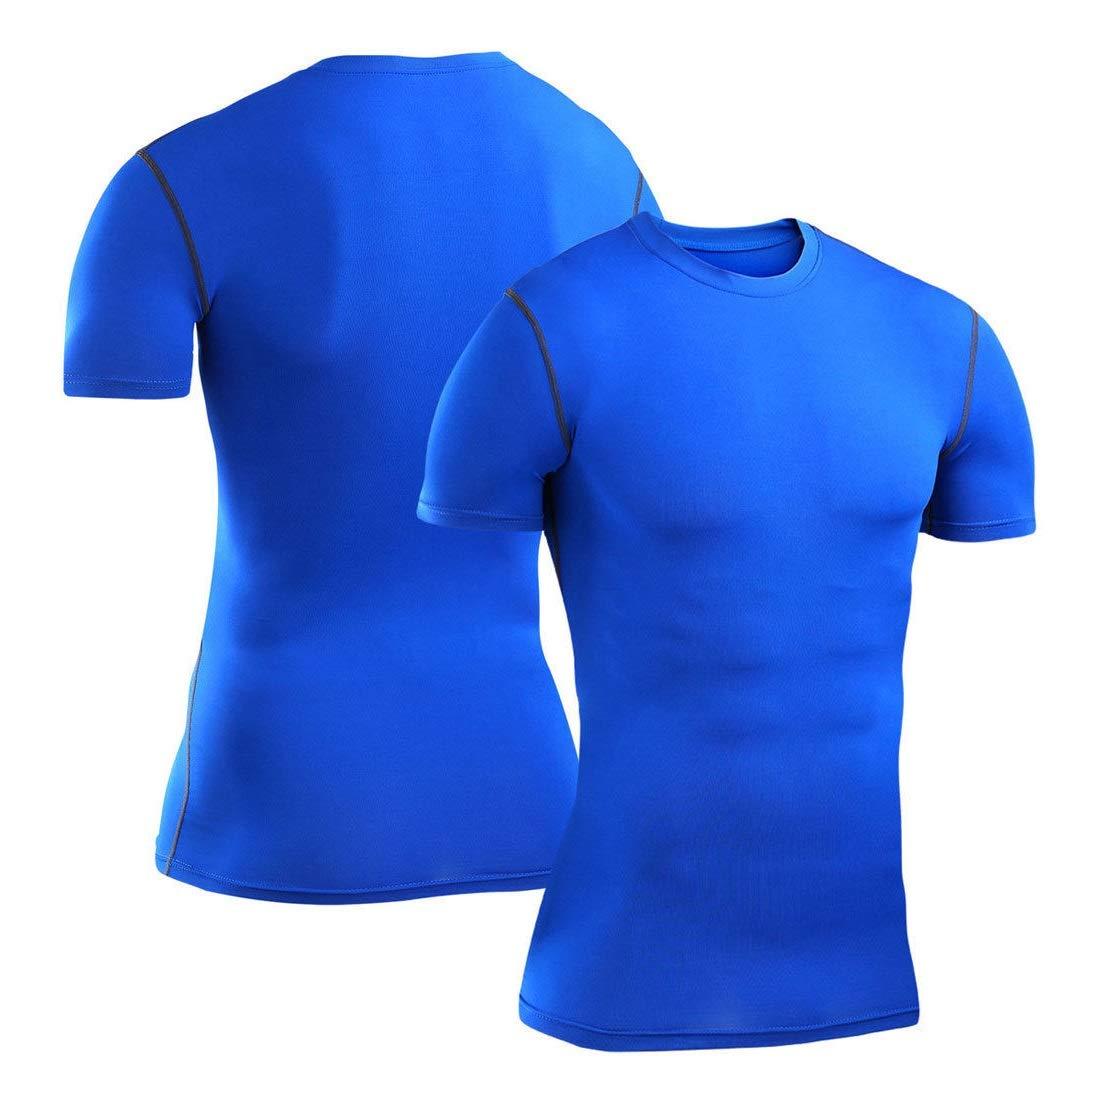 Mens Navy Blue Short Sleeve Compression Shirt Base Layer Tights #HLFN 3XL-4XL Peppermint Store